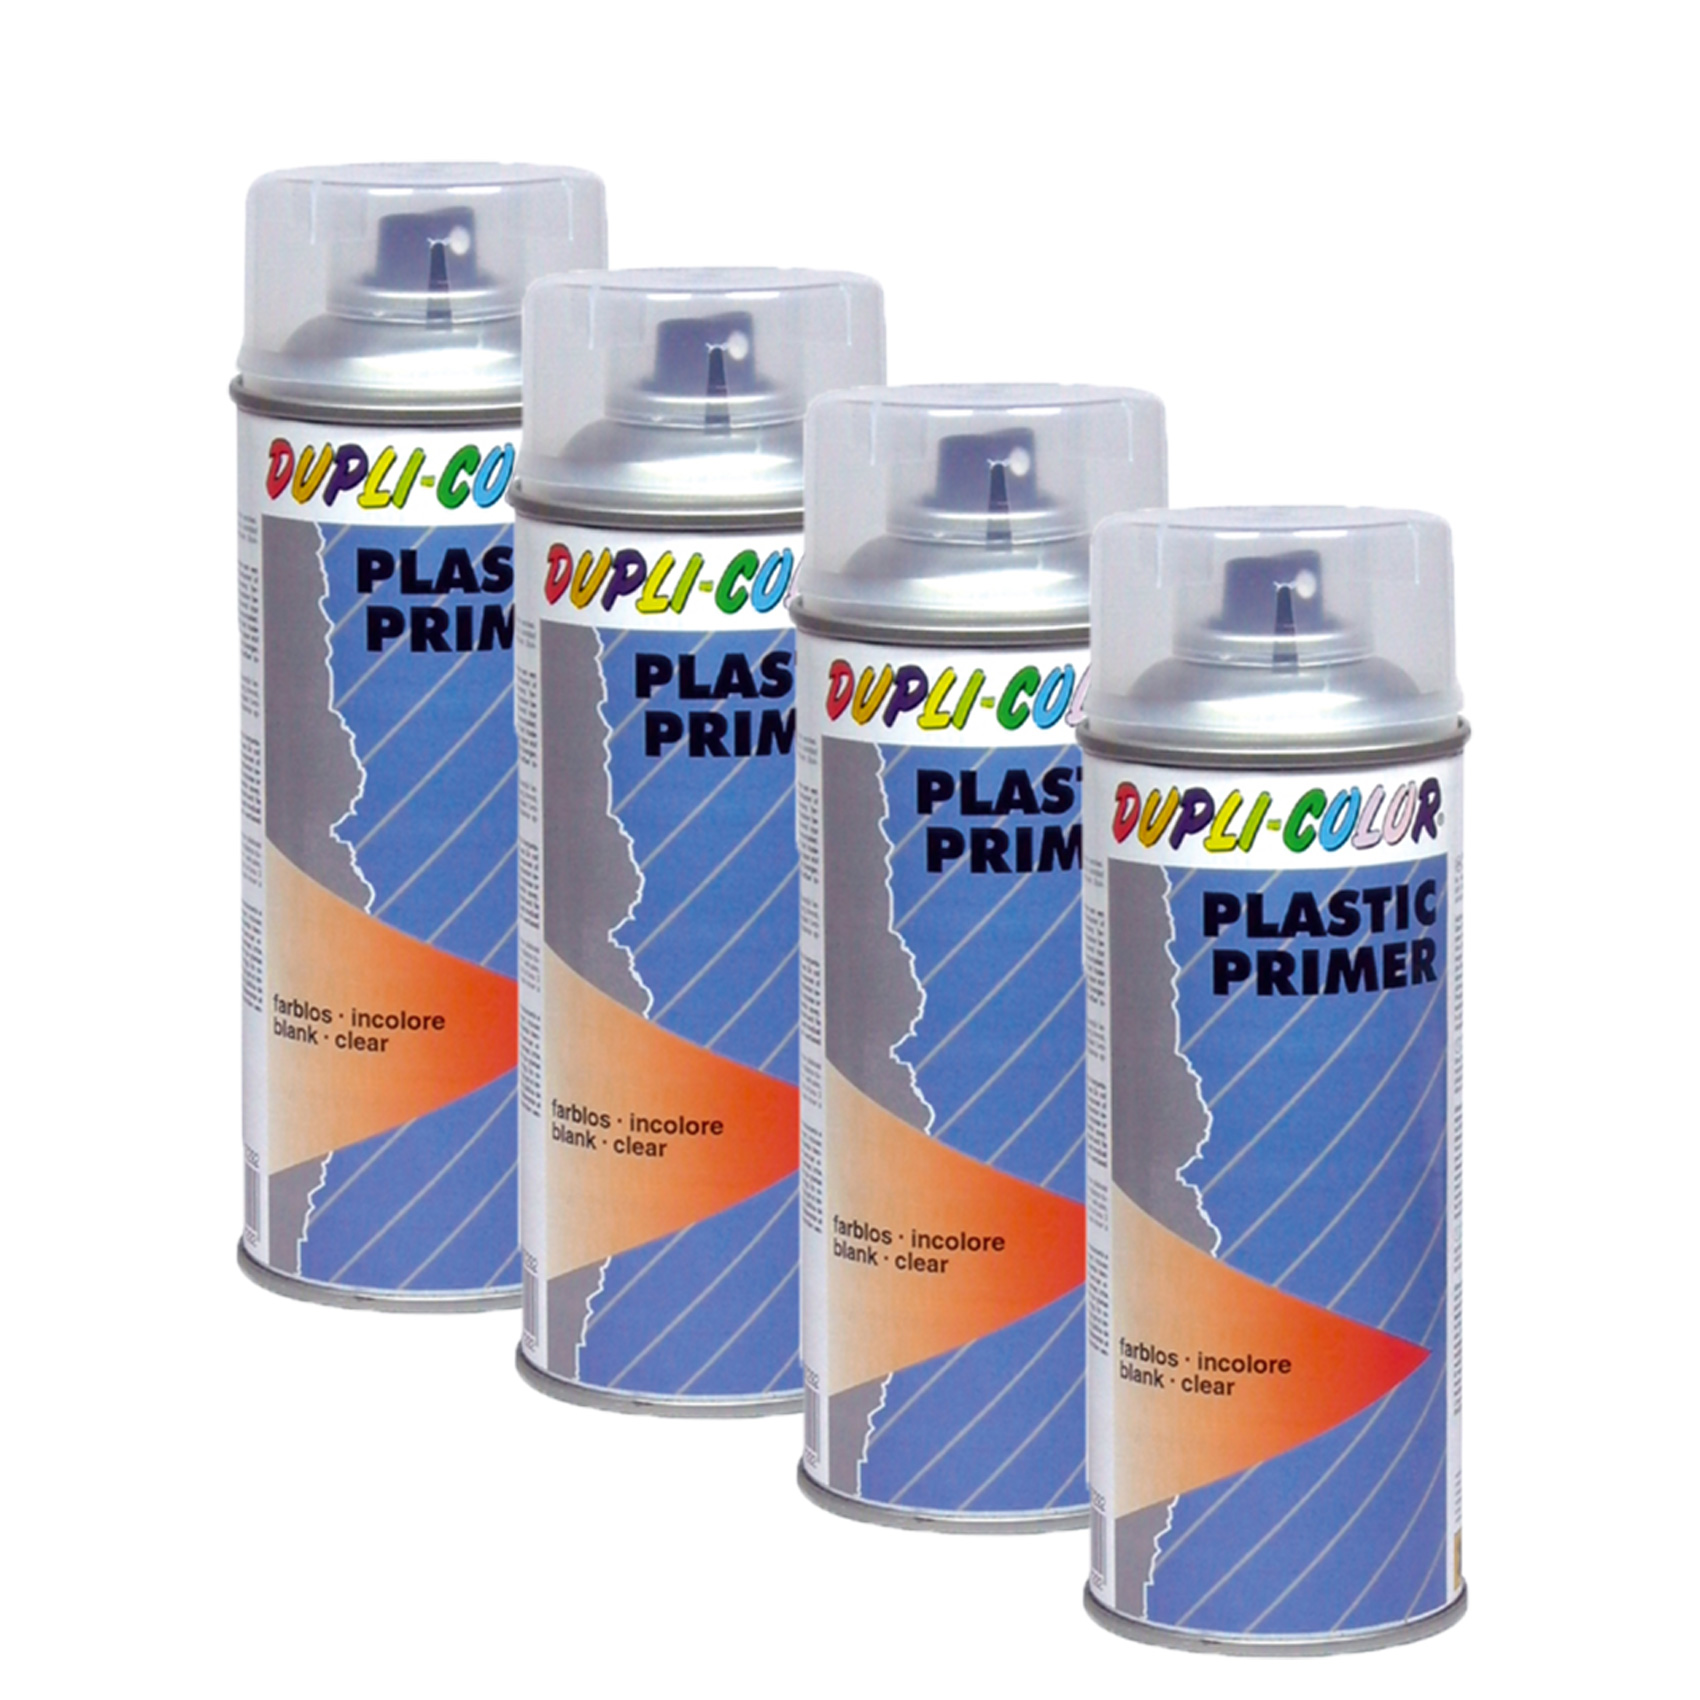 4x-DUPLI-COLOR-DC-PLASTIC-PRIMER-HAFTVERMITTLER-LACKIERUNG-HARTKUNSTSTOFF-150-ML